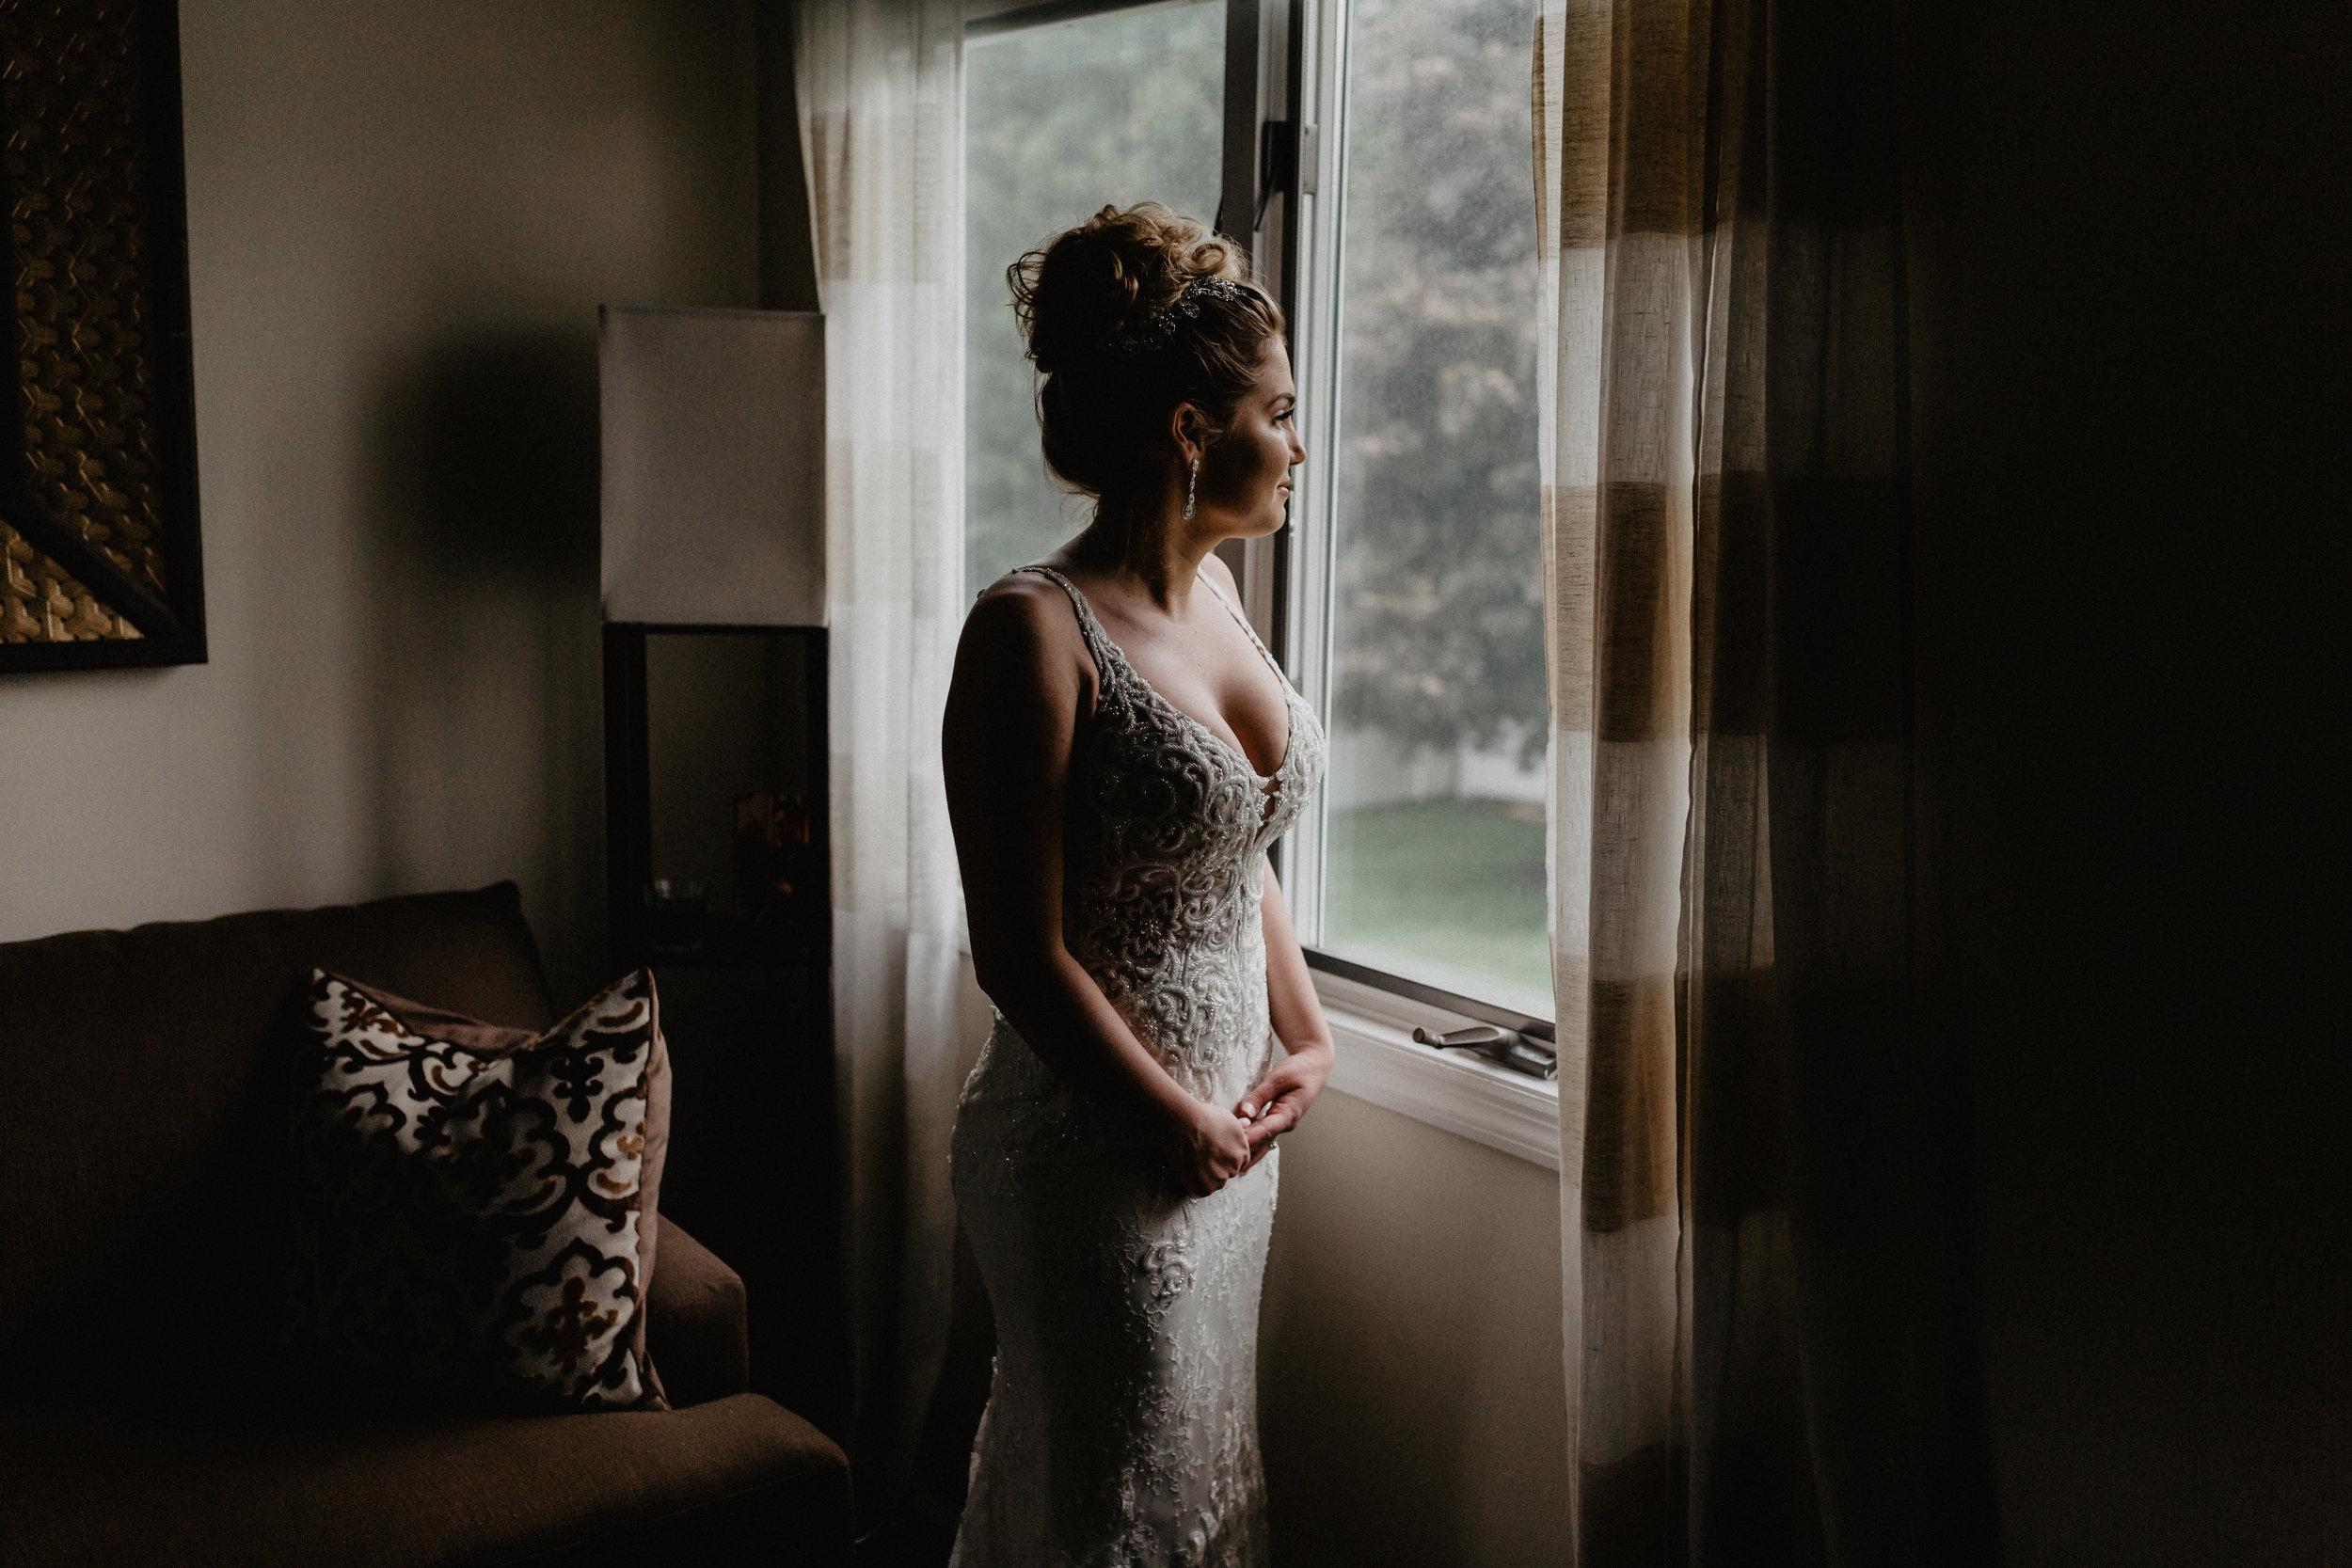 old_daley_on_crooked_lake_wedding_-31.jpg